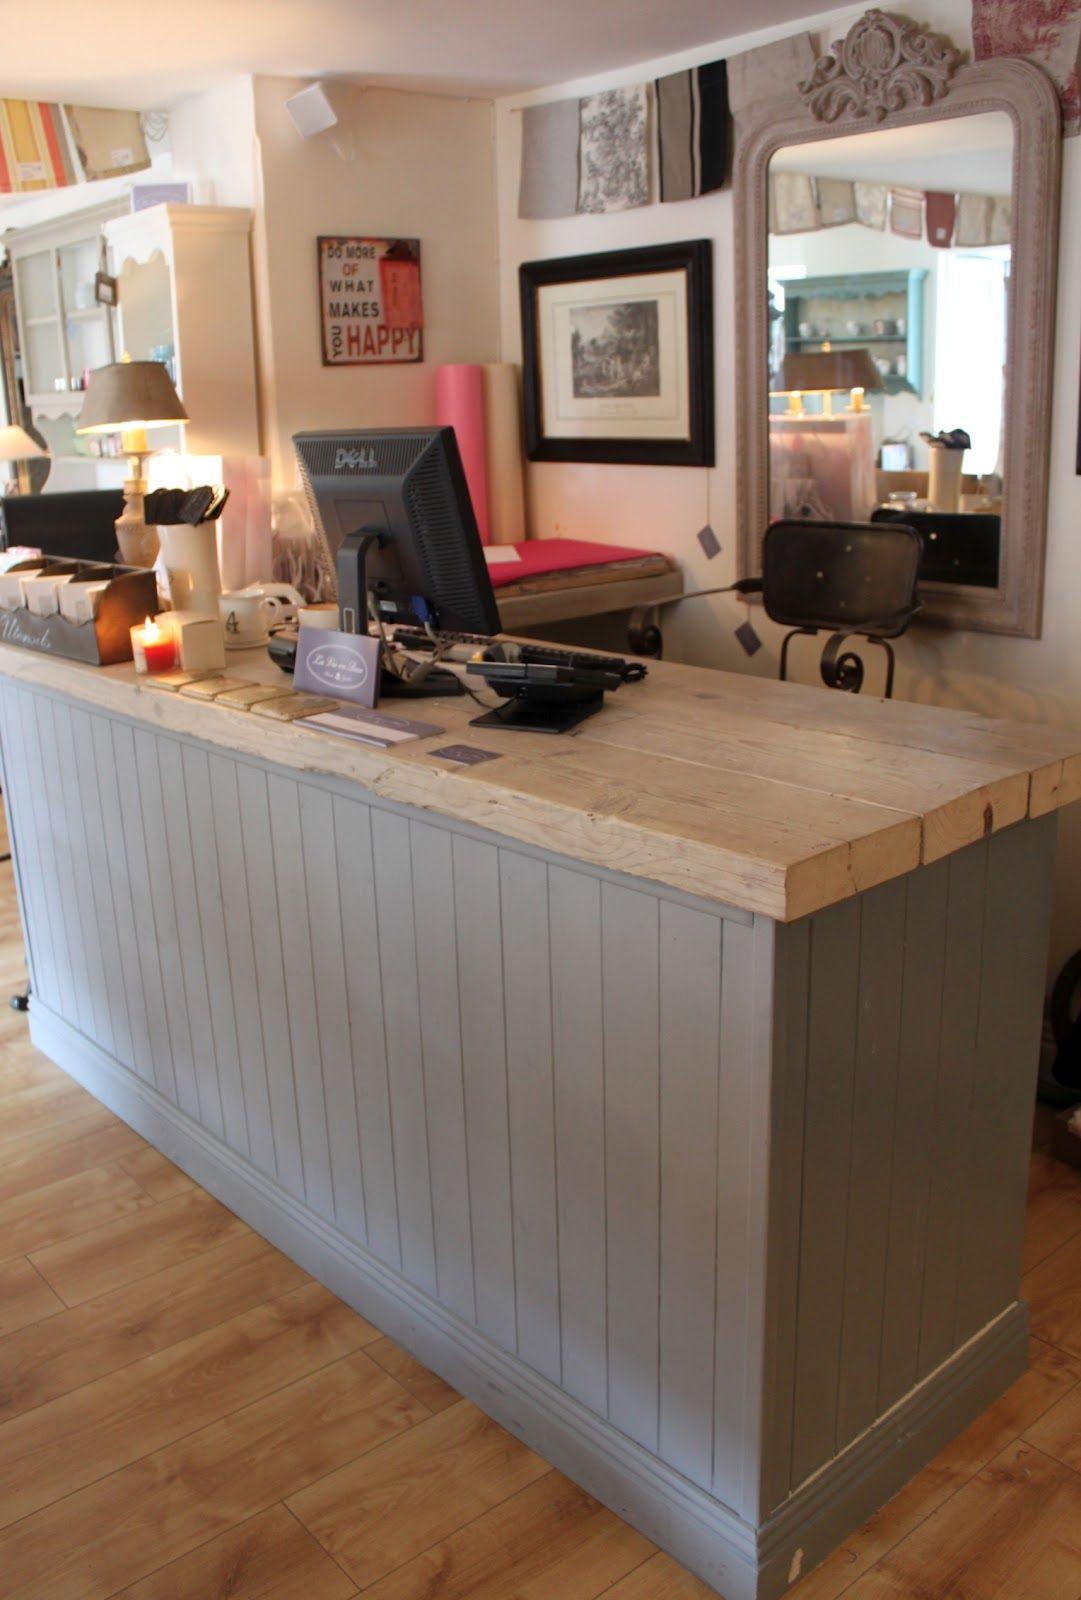 The 25 Best Shop Counter Design Ideas On Pinterest Cafe